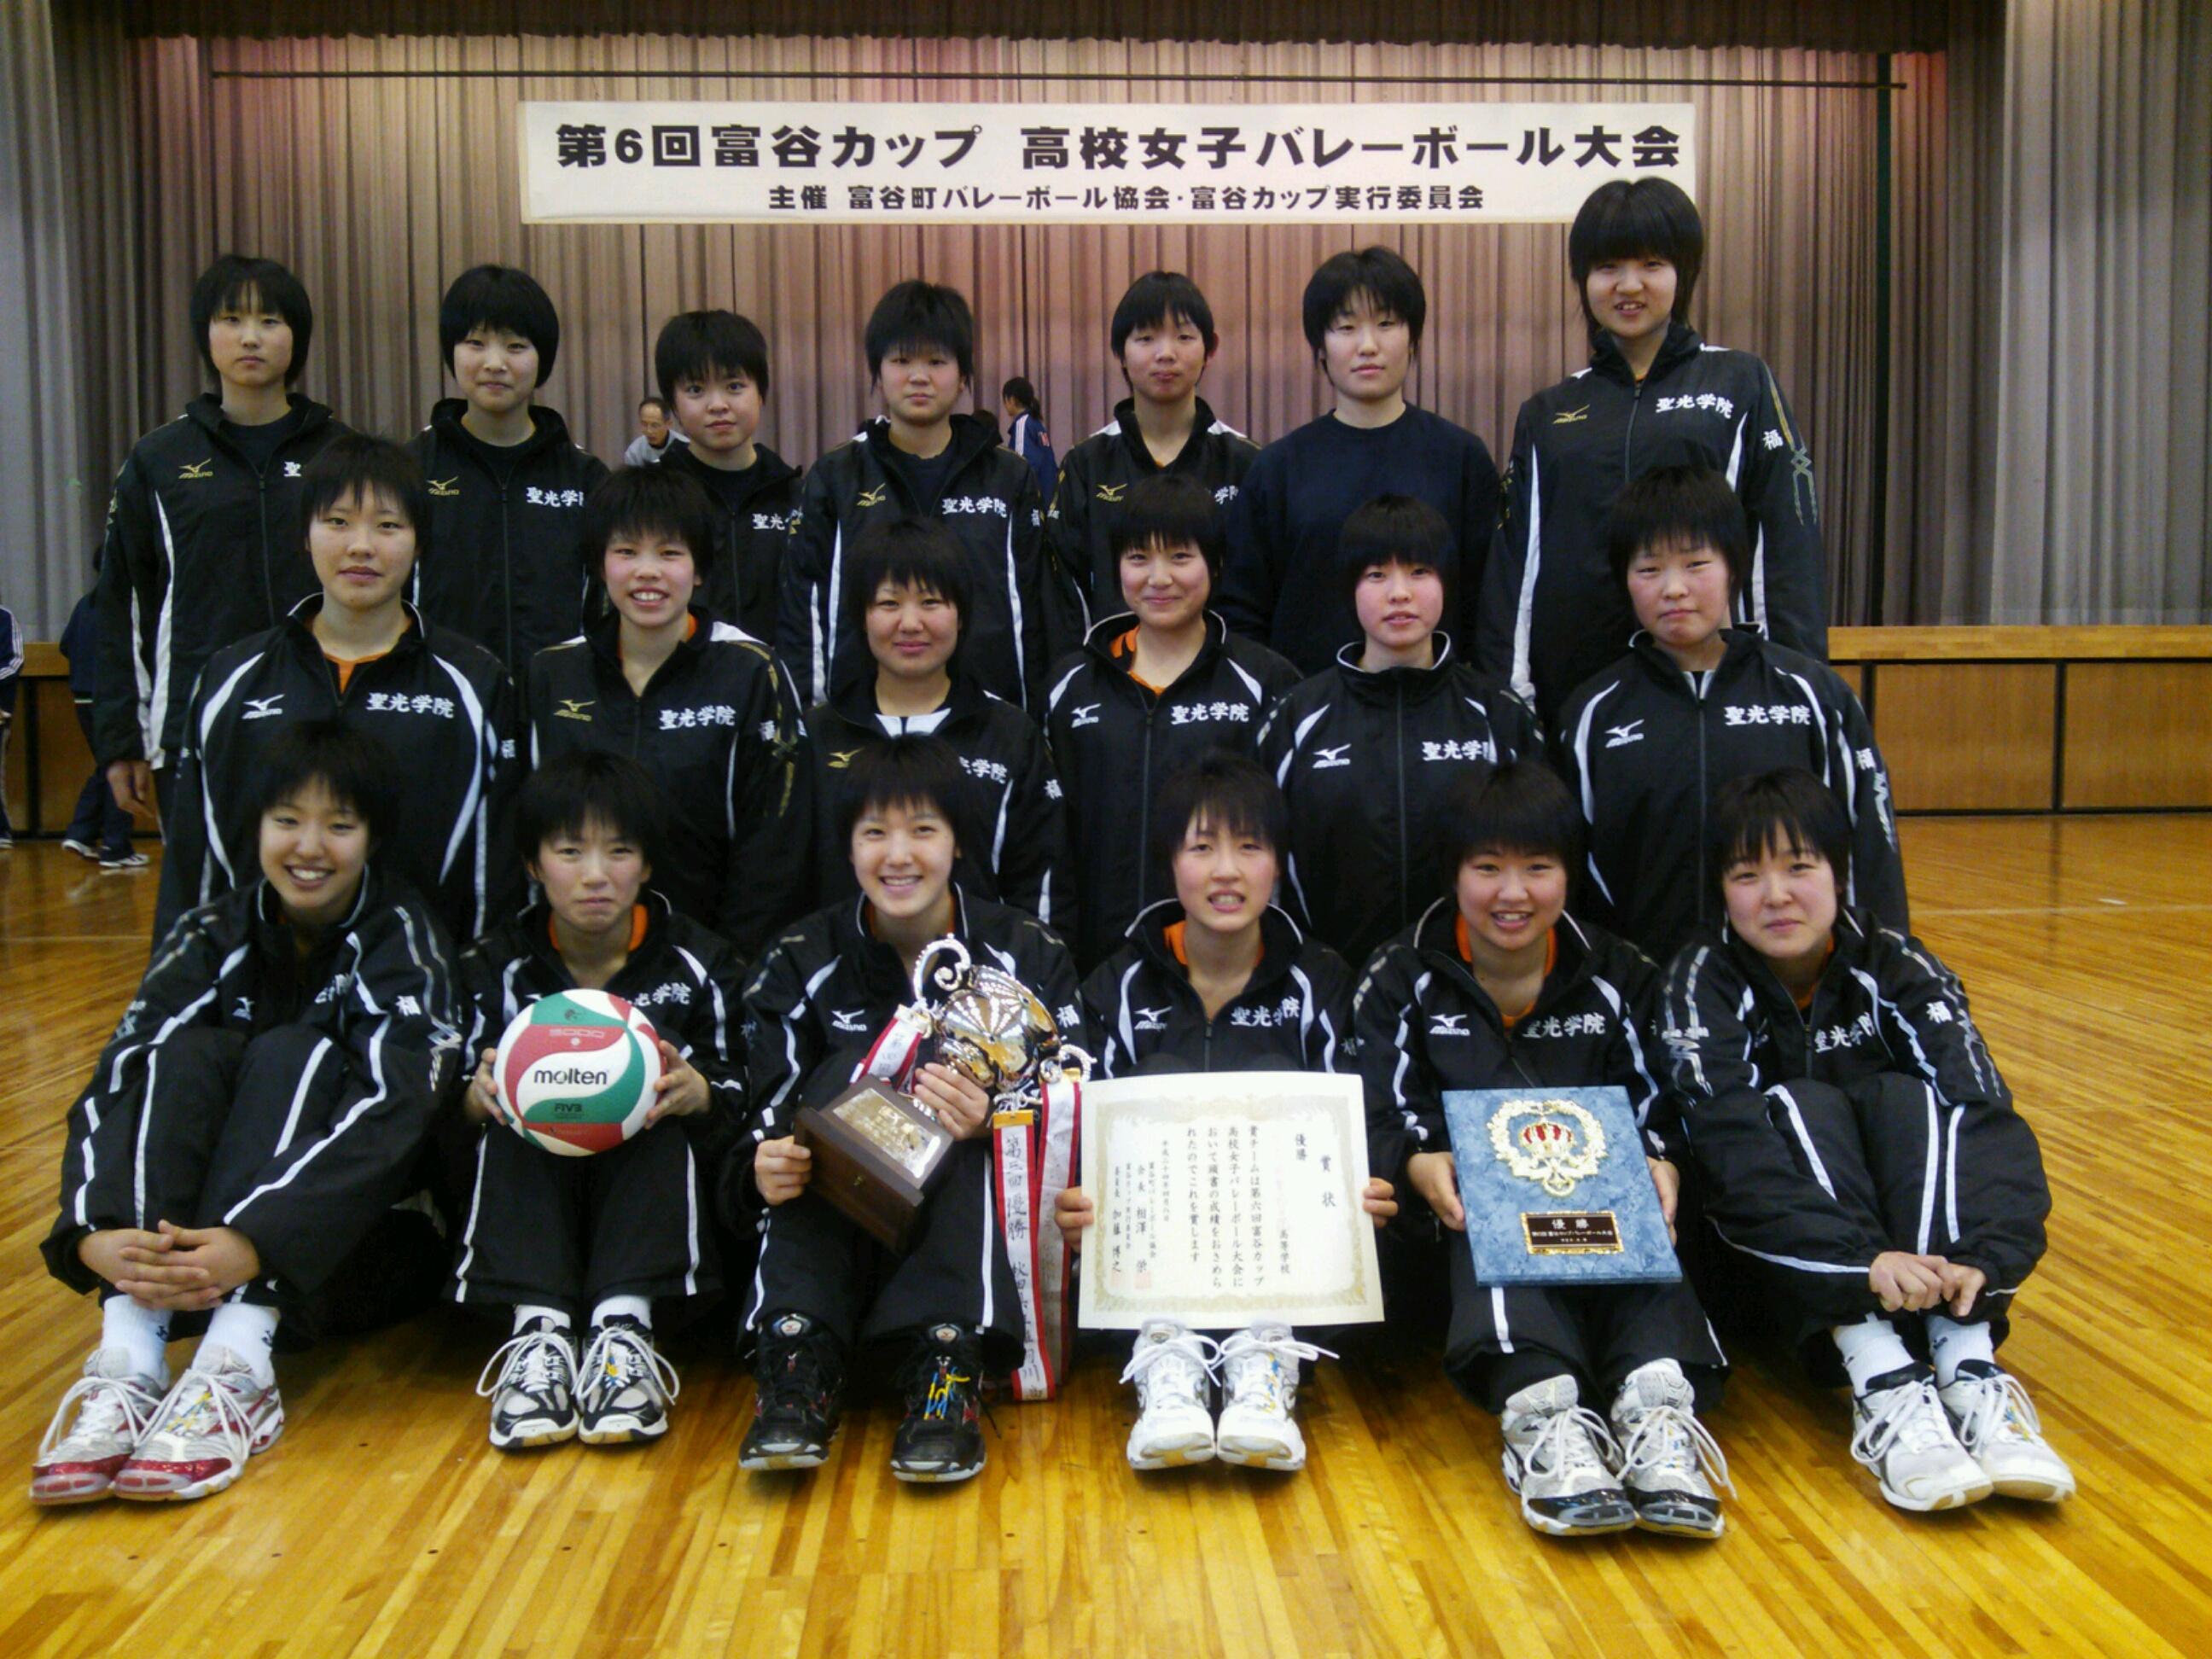 女子 黒川 バレー 部 高校